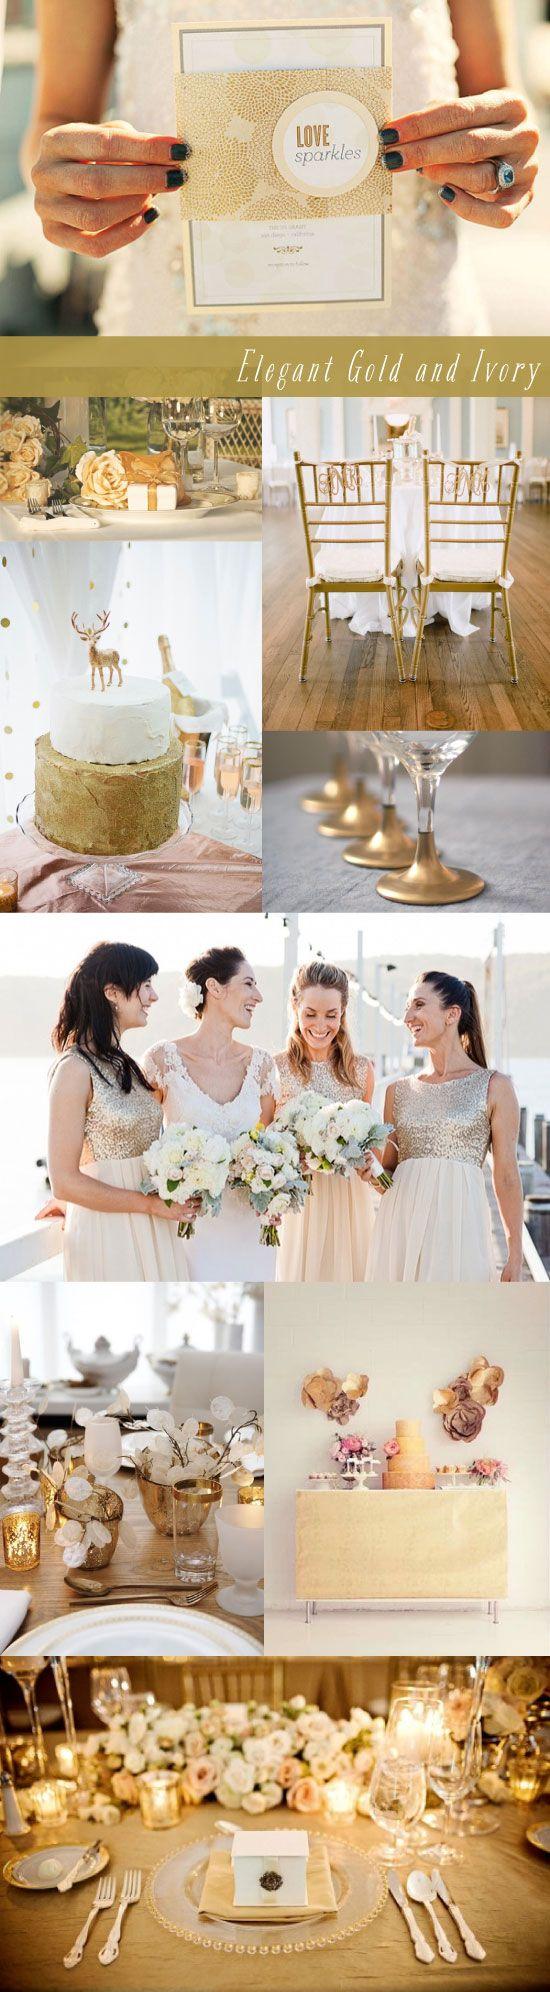 Wedding Inspiration Board Elegant Gold and Ivory Theme ...